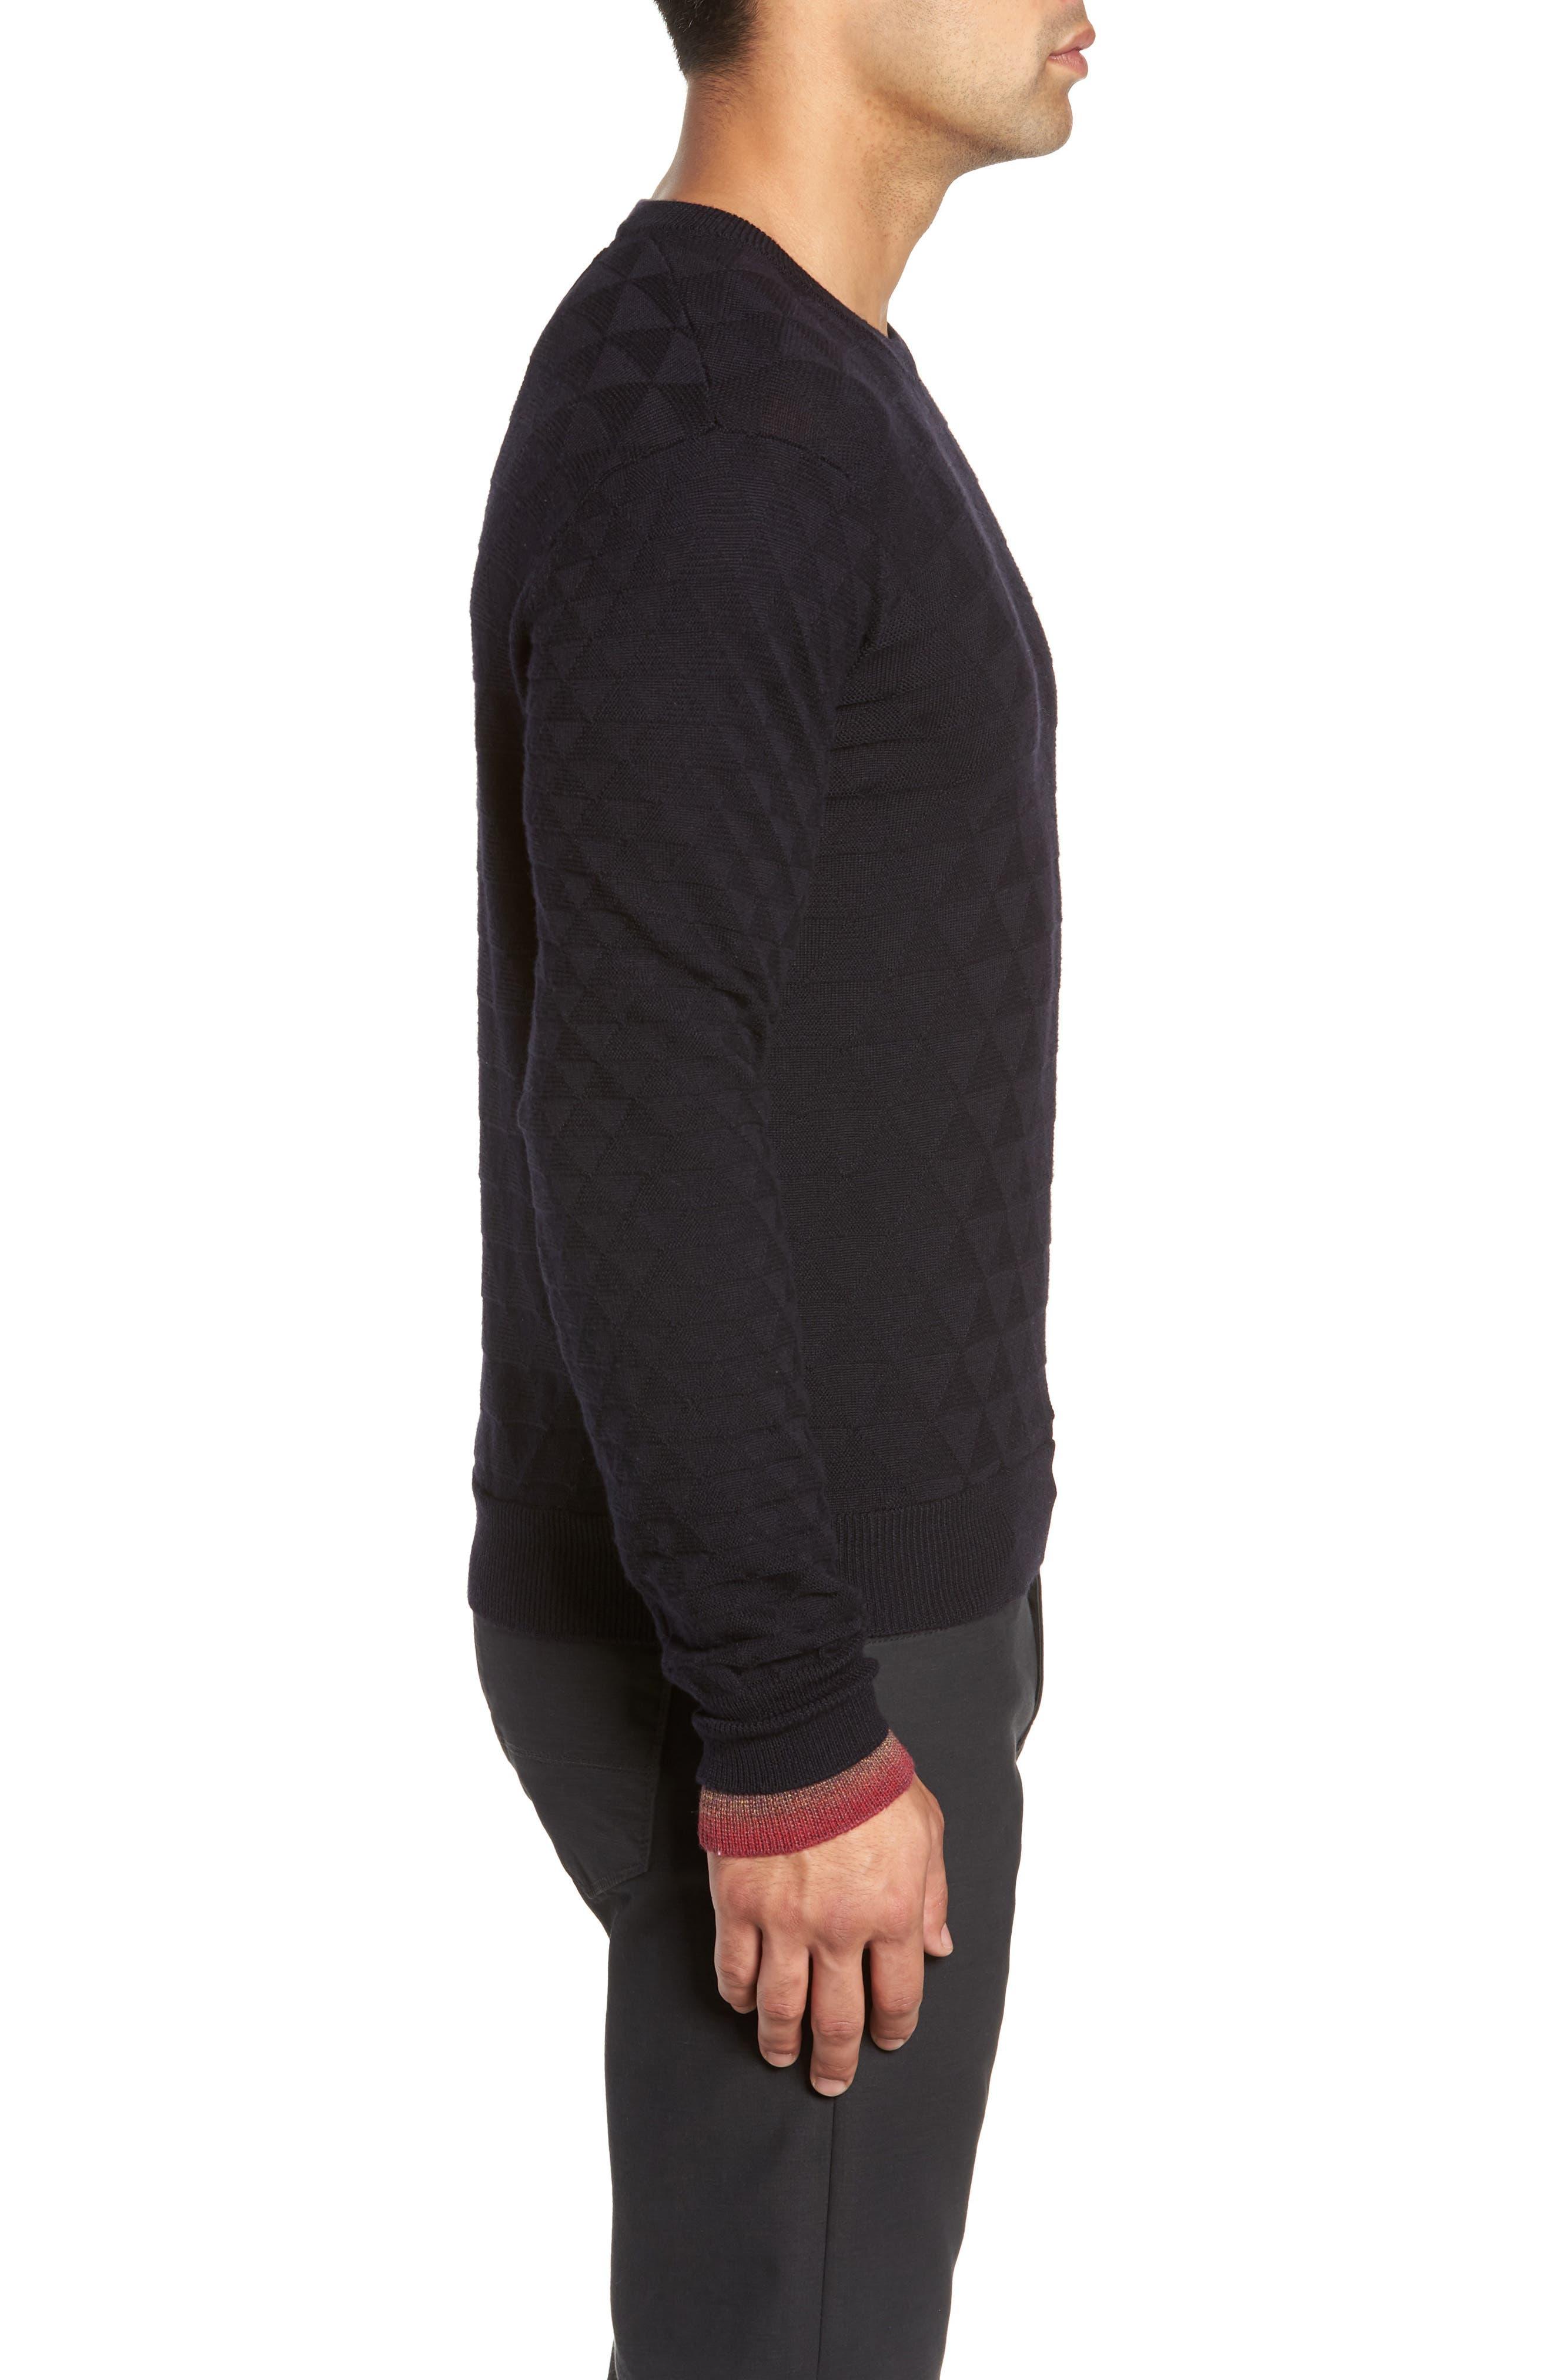 Blackburn Classic Fit Sweater,                             Alternate thumbnail 3, color,                             BLACK